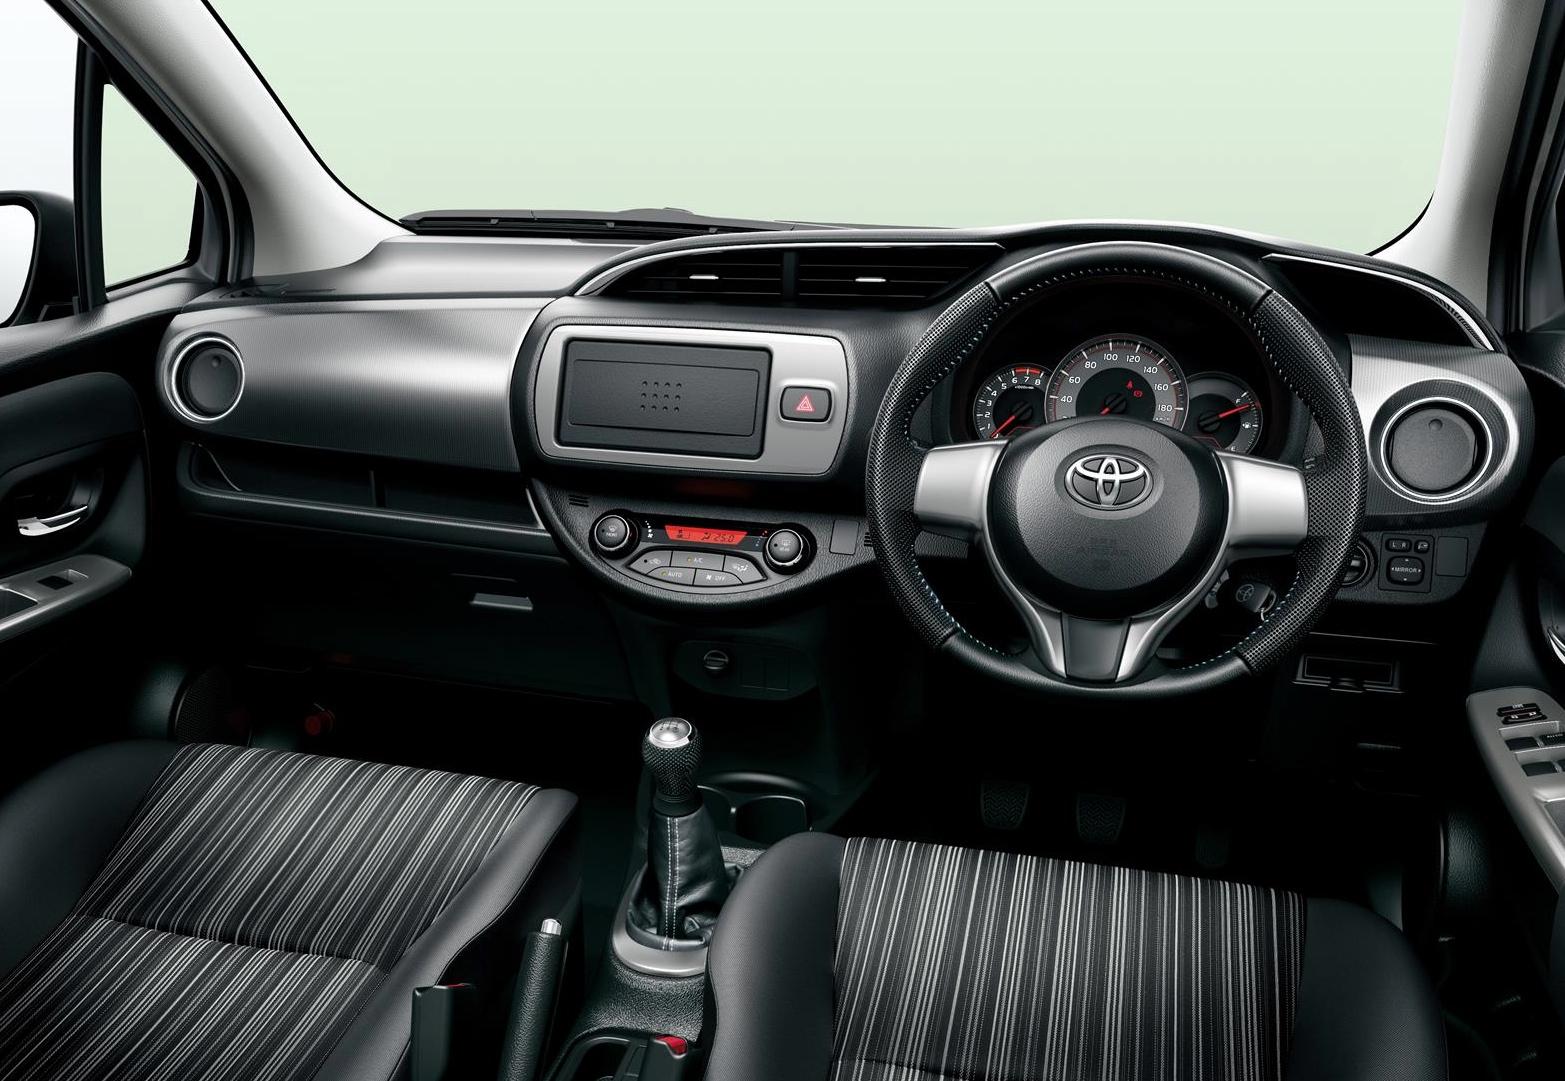 New toyota yaris 2016 interior best accessories home 2017 for Interior yaris 2017